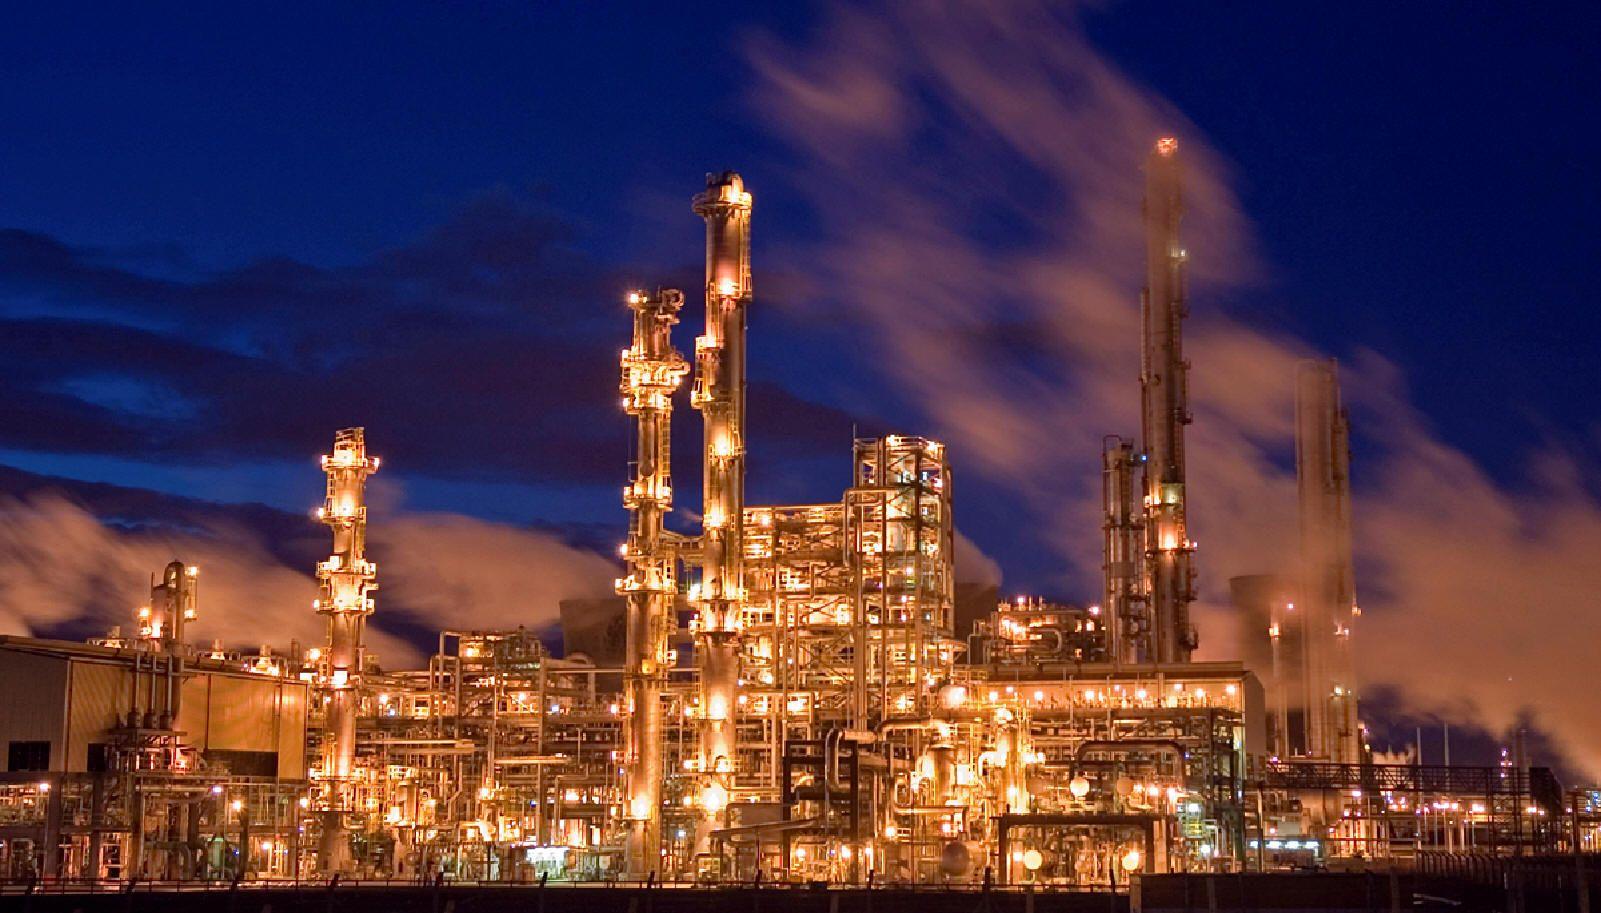 refinery | Metal Dystopia: Science-Fiction Noir in Cities ...